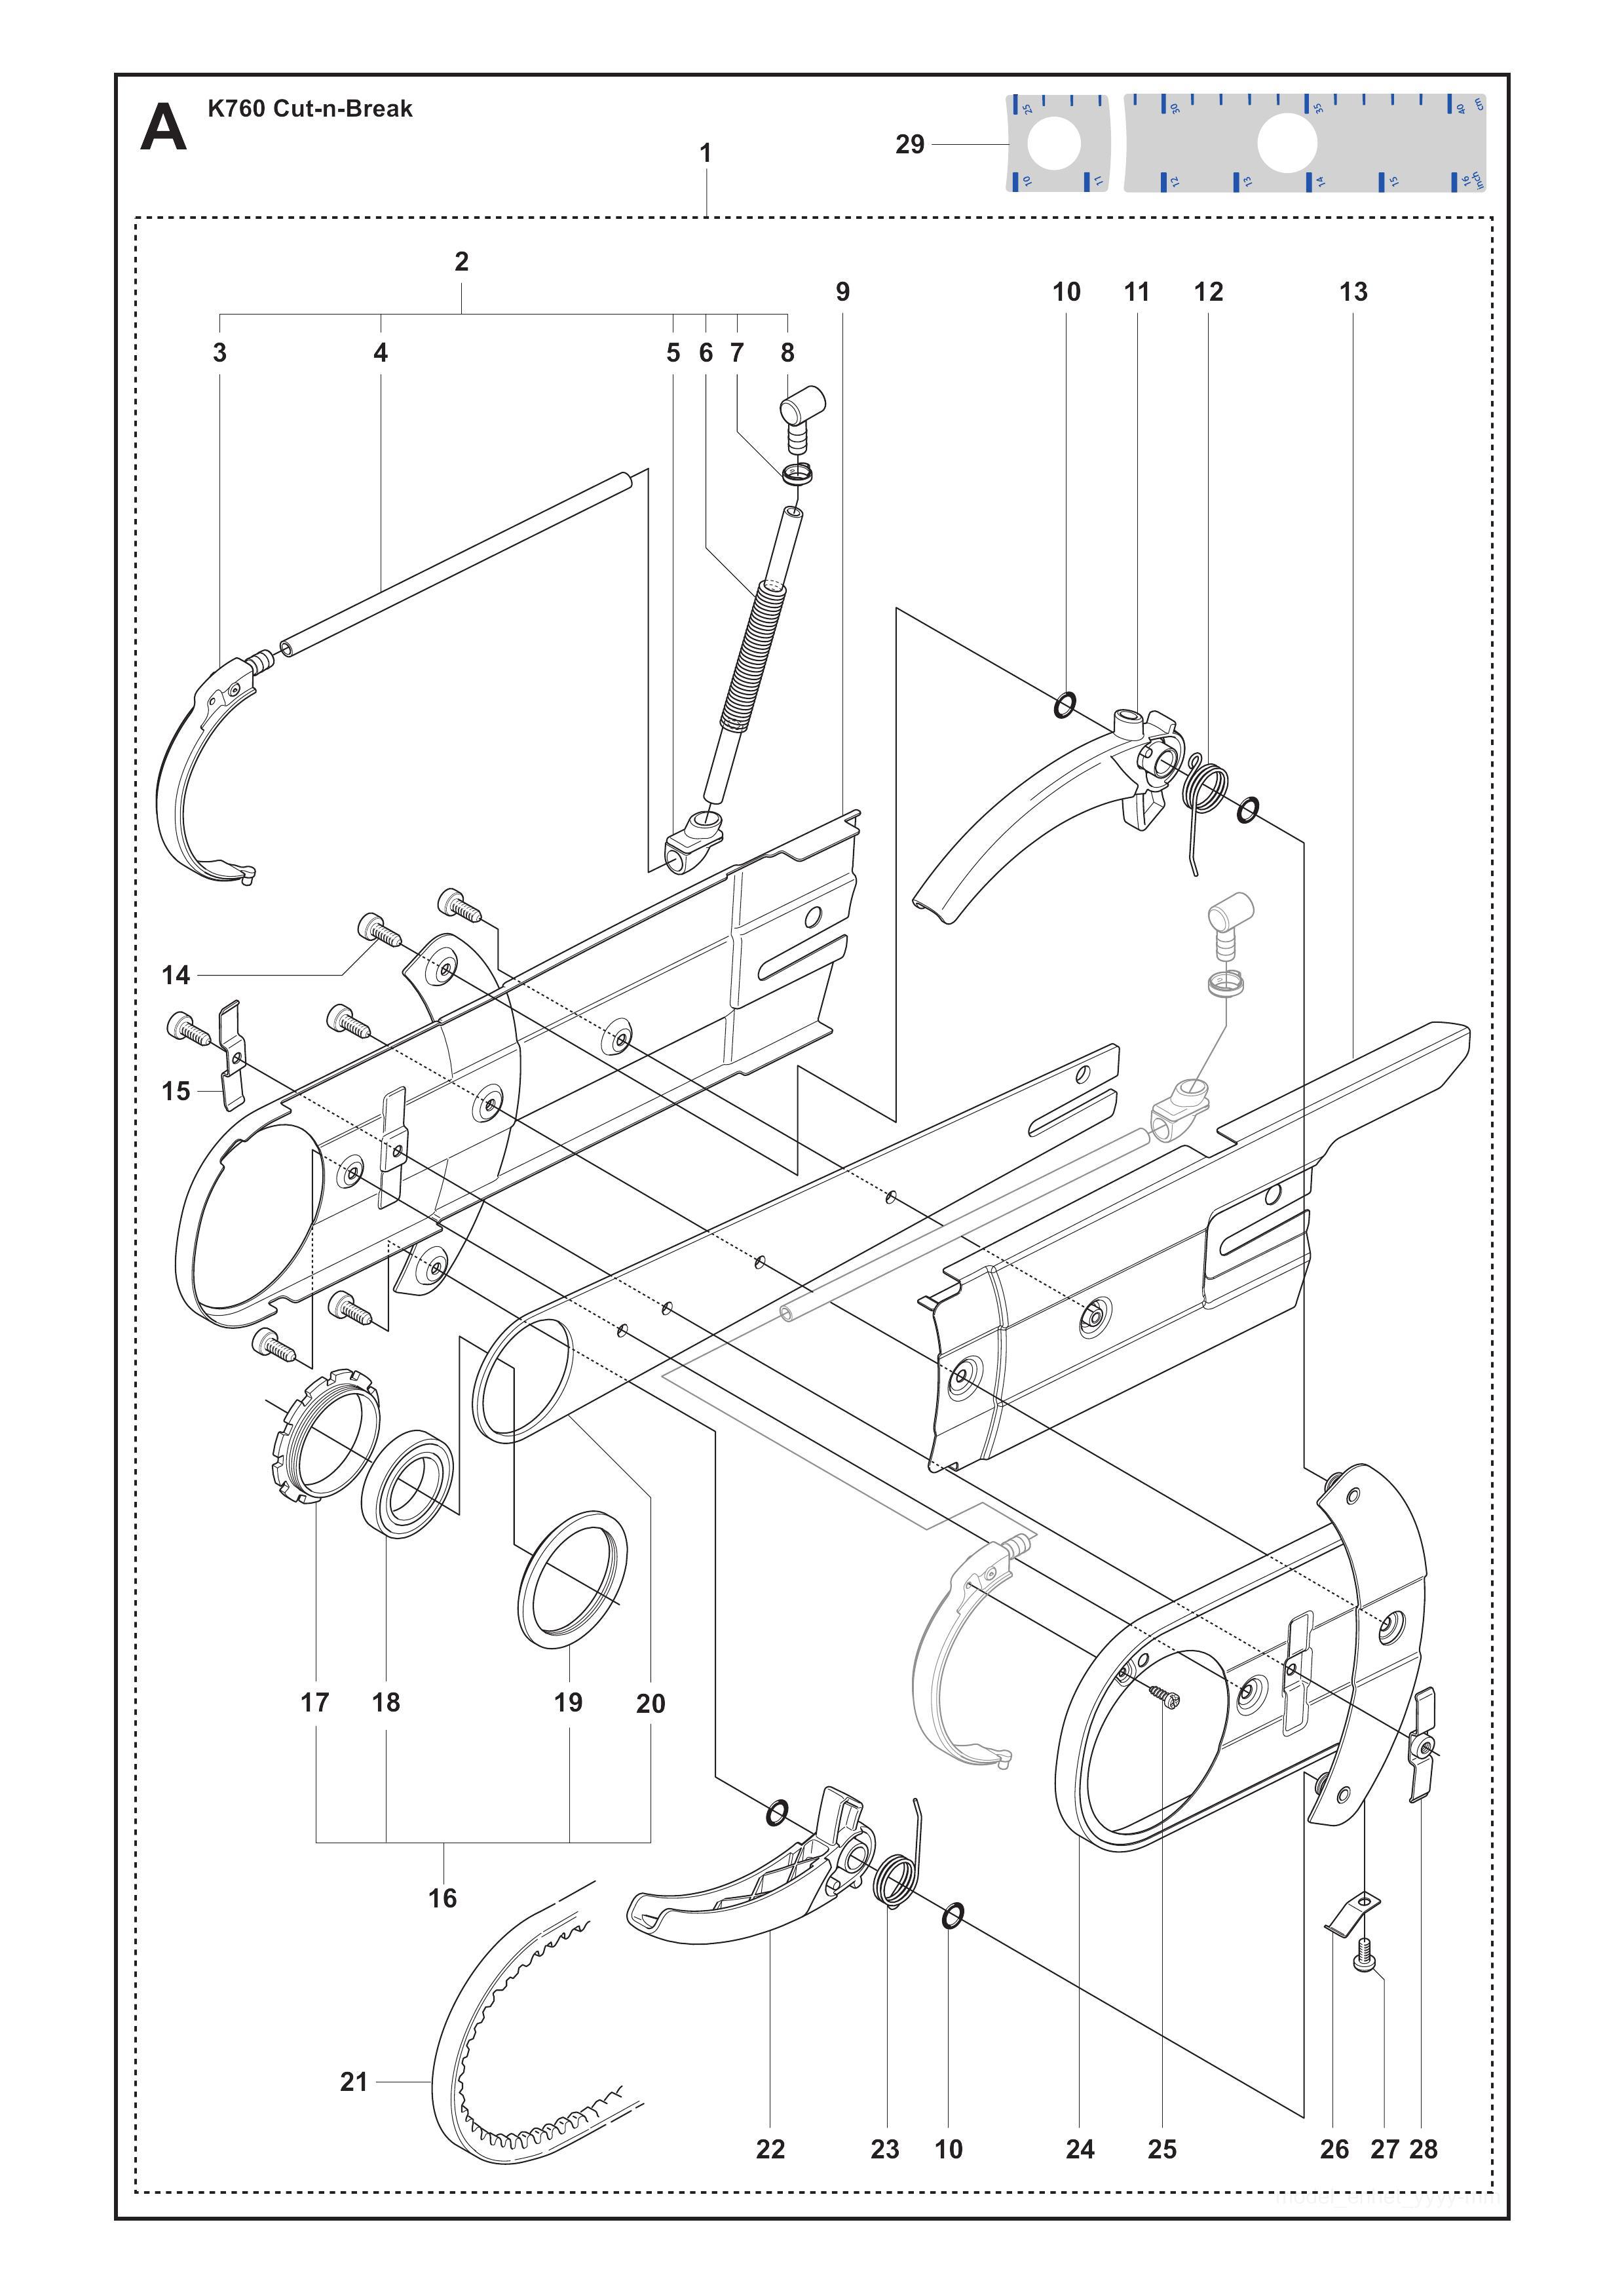 Parts for k760 cut n break 2009 11 powerhouse distributing rh powerhousetoolparts husqvarna k760 carb